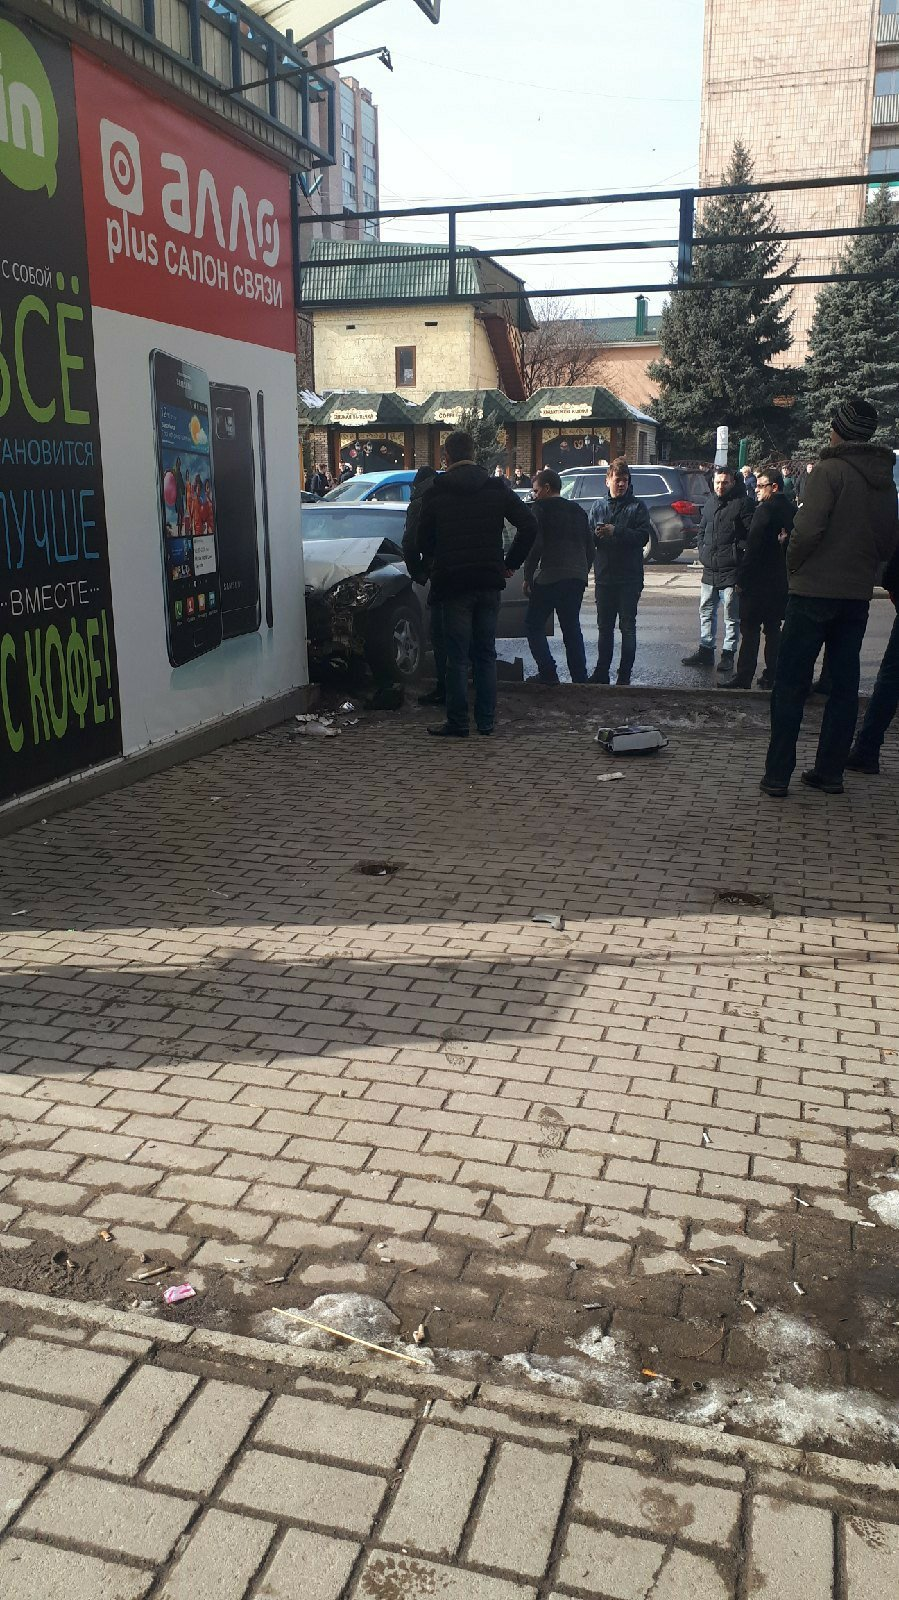 В центре Луганска произошло ДТП: у водителя остановилось сердце, - ФОТО, фото-1